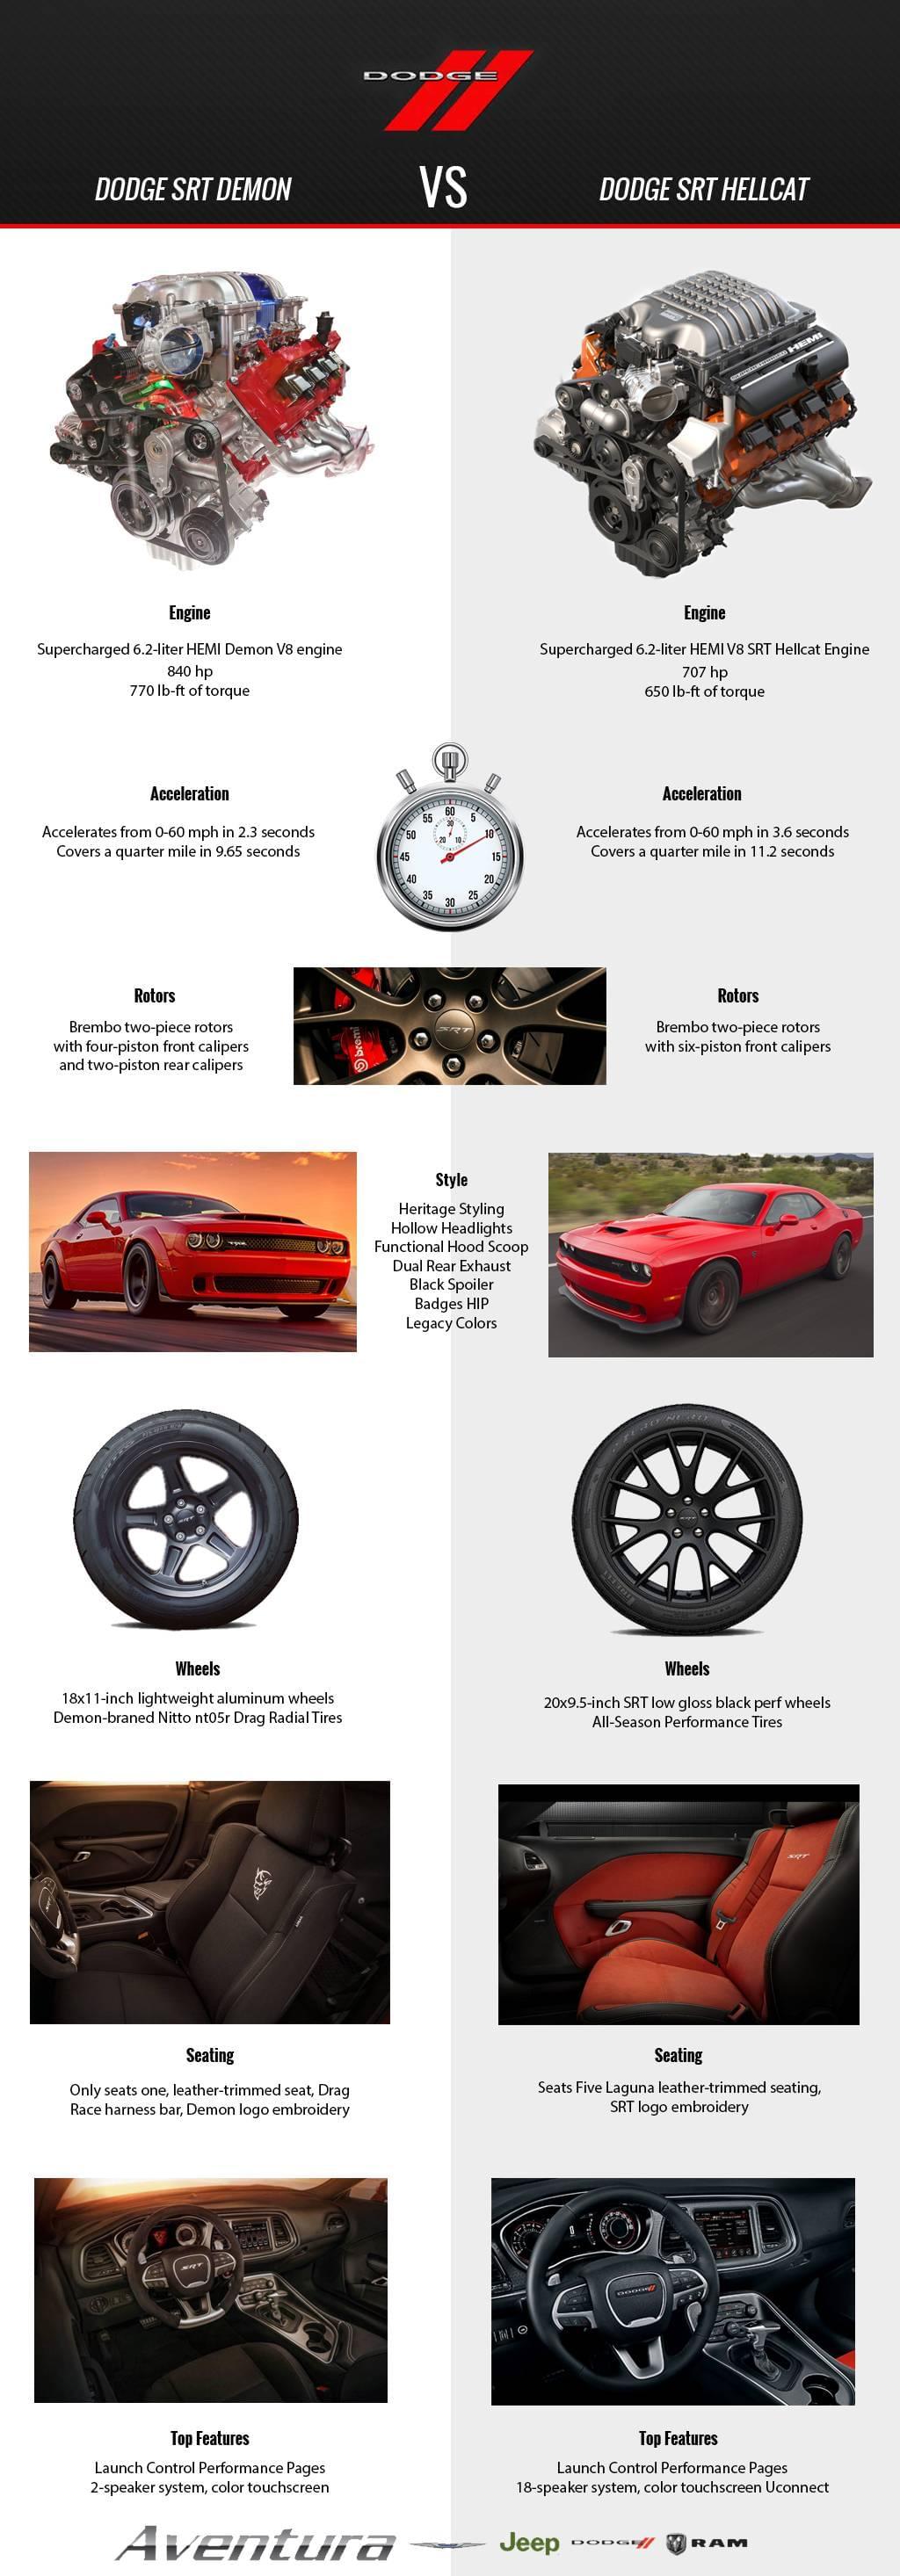 Aventura Dodge Challenger SRT Demon Hellcat Comparison